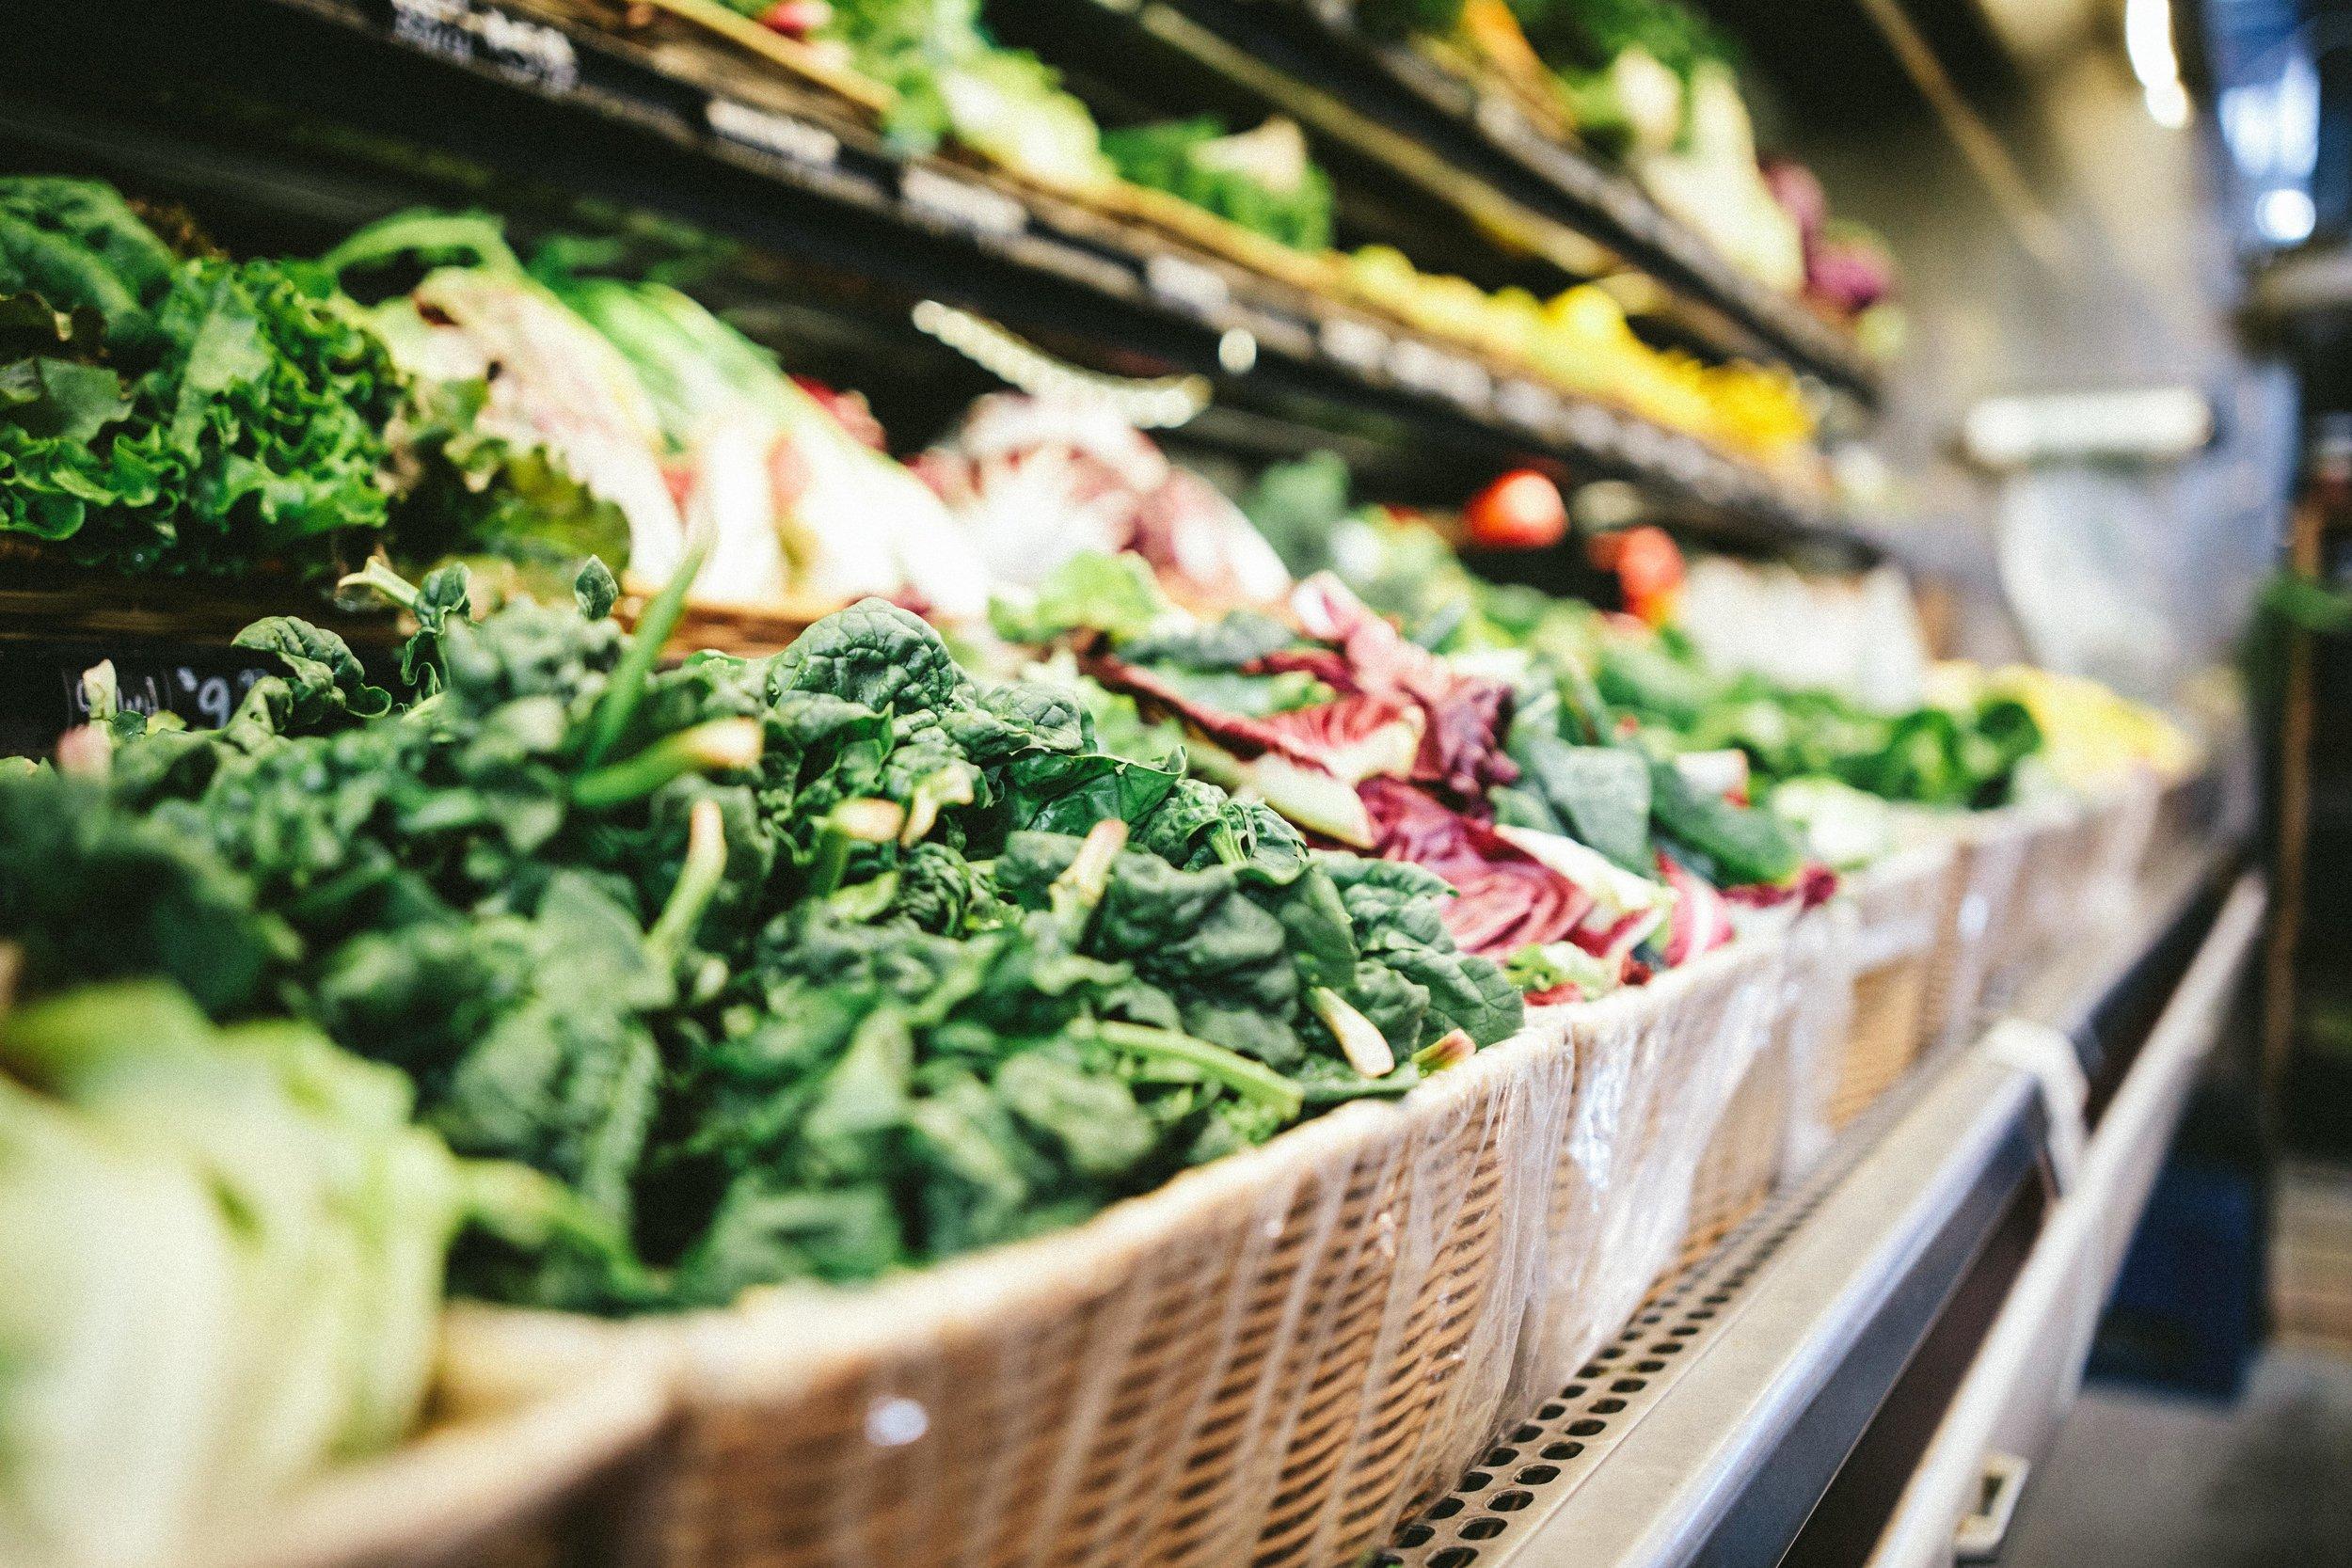 grocery produce.jpg